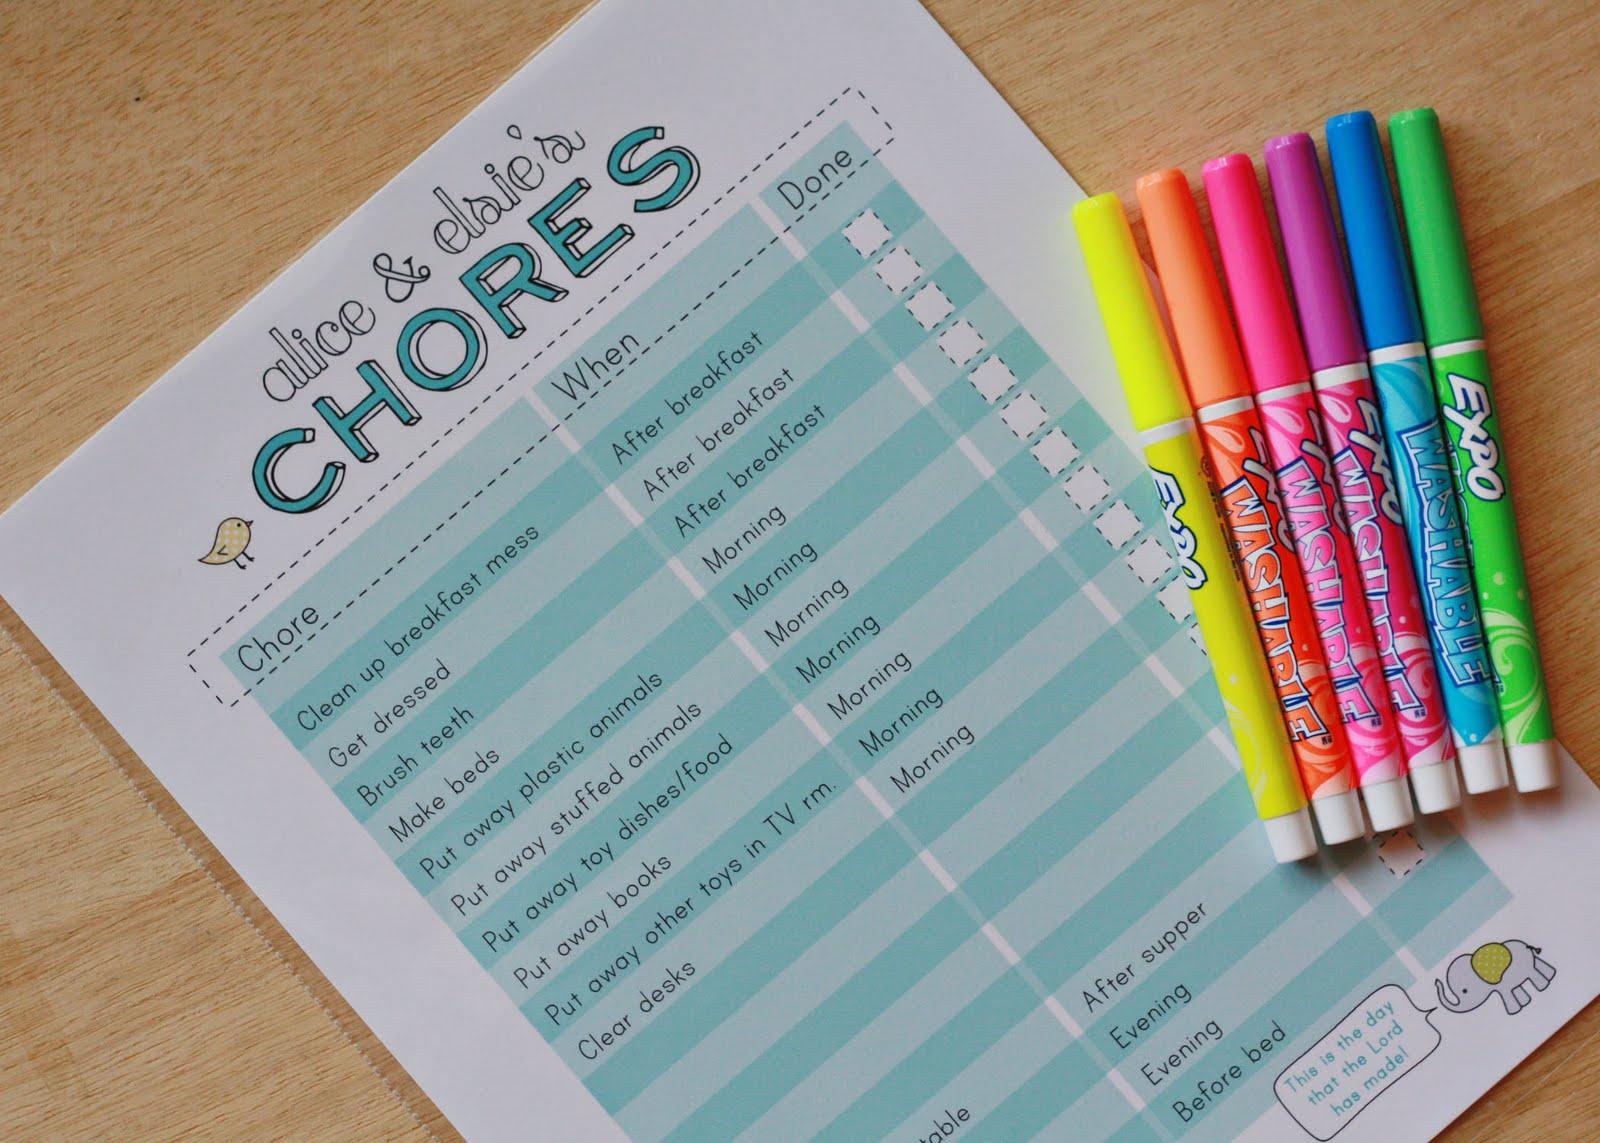 Amy J Delightful Blog Printable Chore Chart